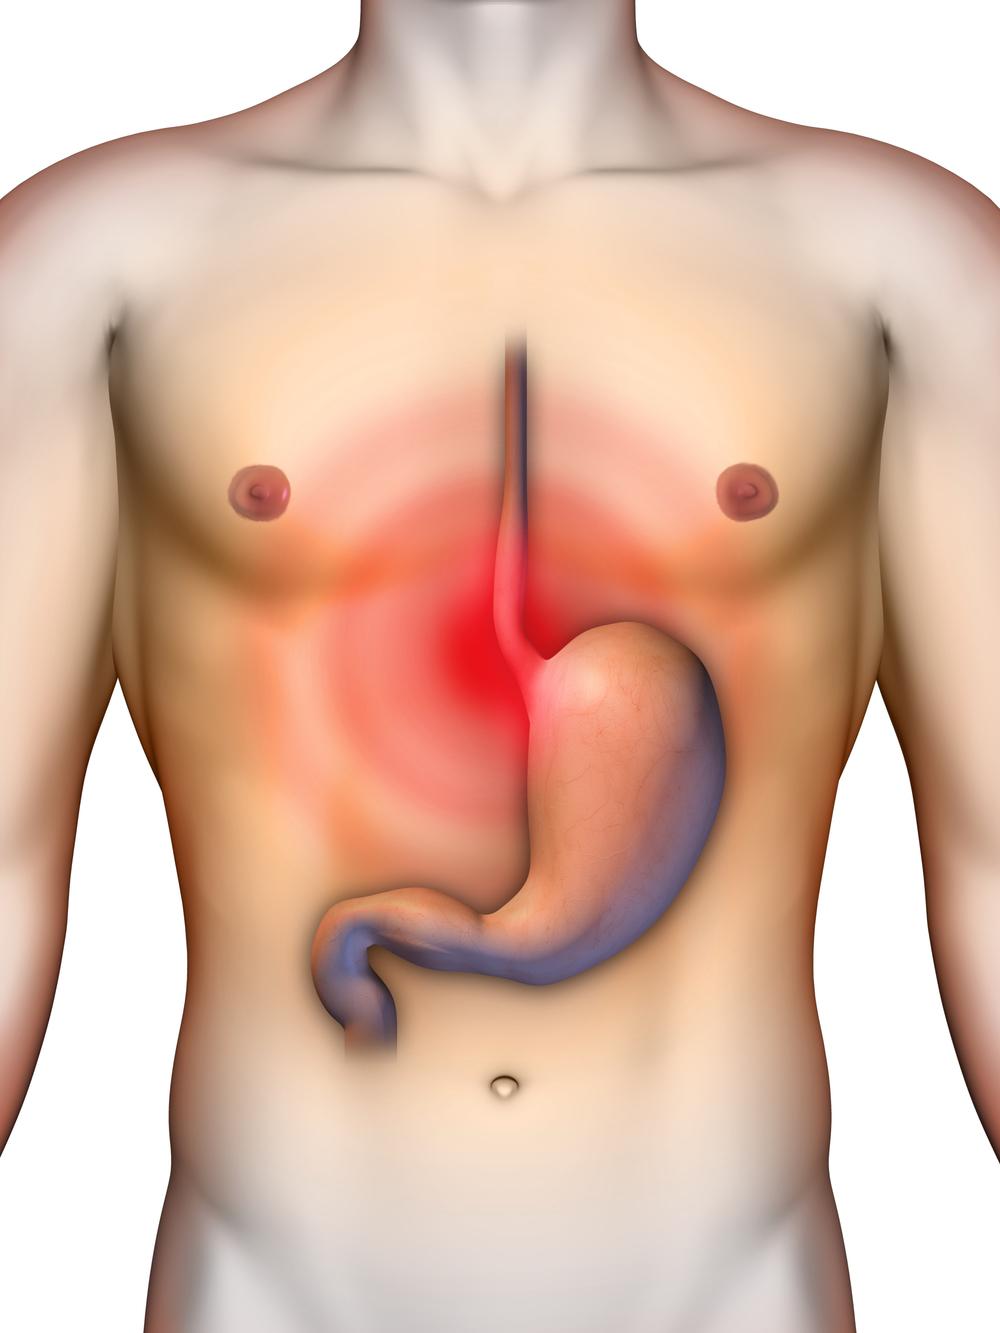 Digestion - Acid Reflux - GERD